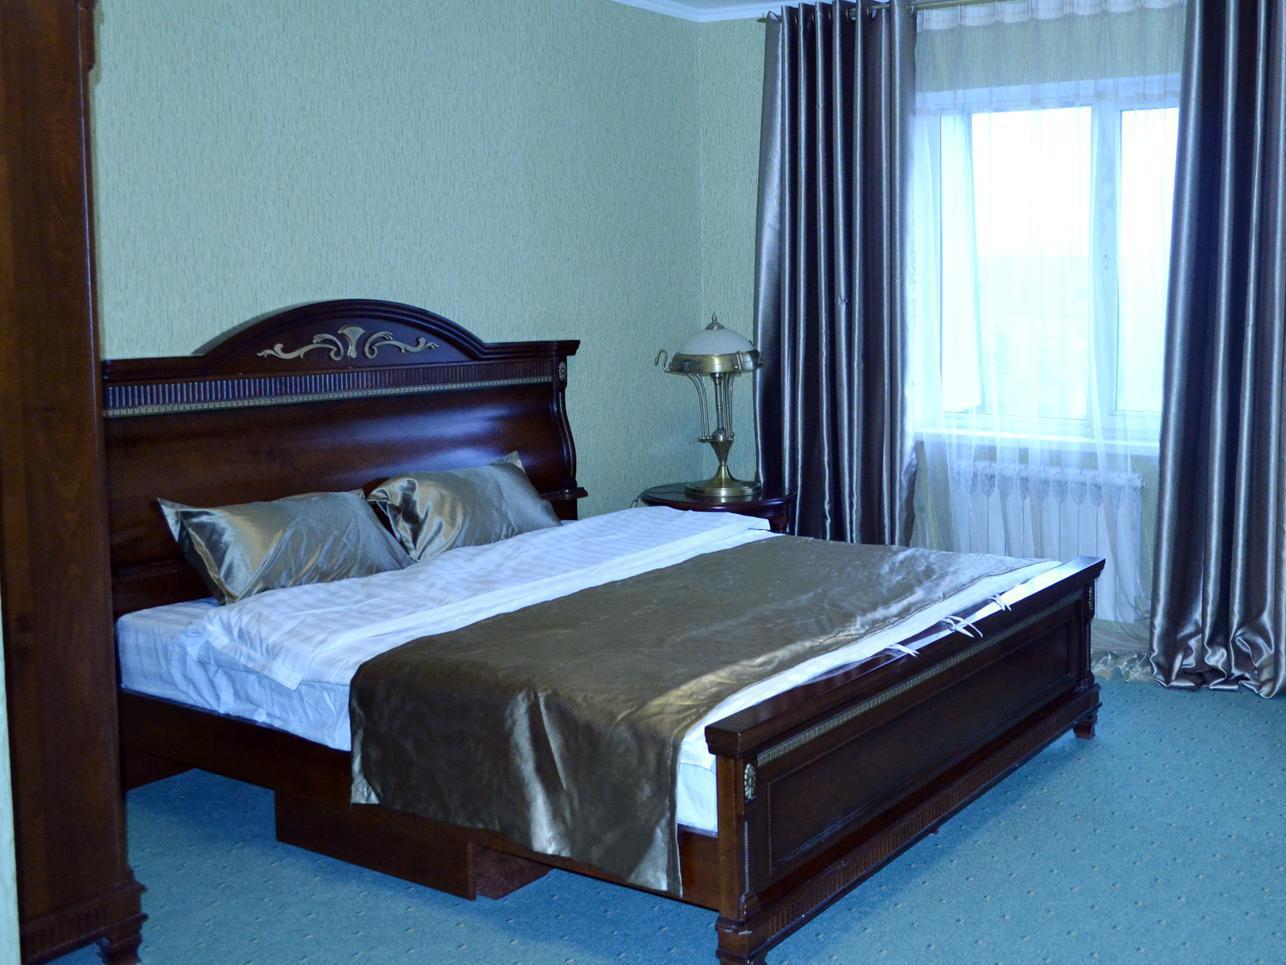 Ereimentau Hotel